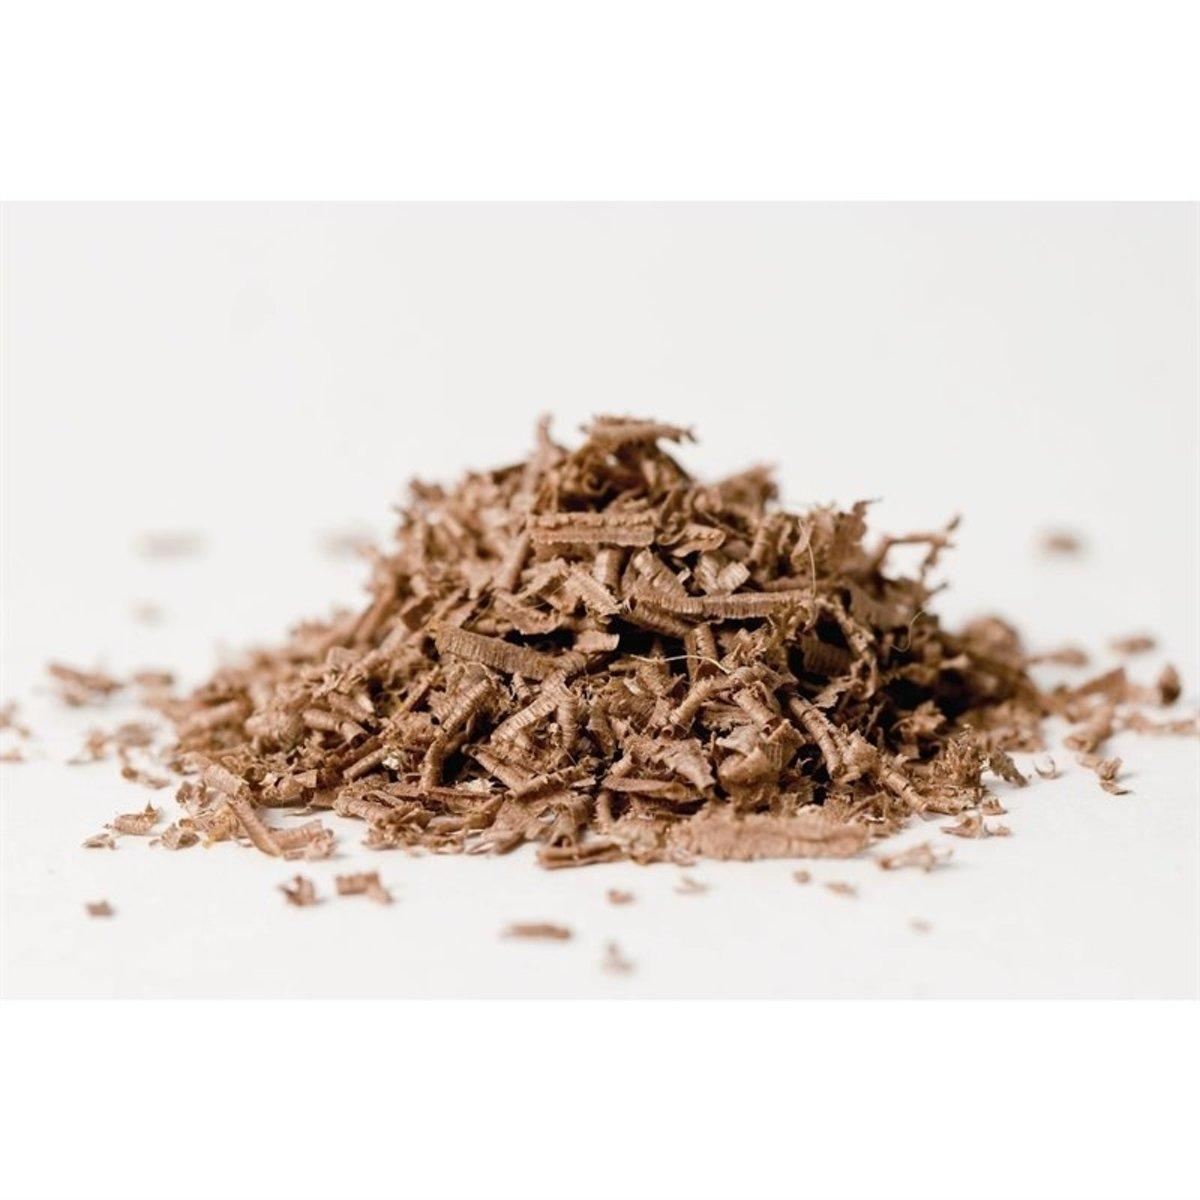 Polyscience houtmot Bourbon kopen